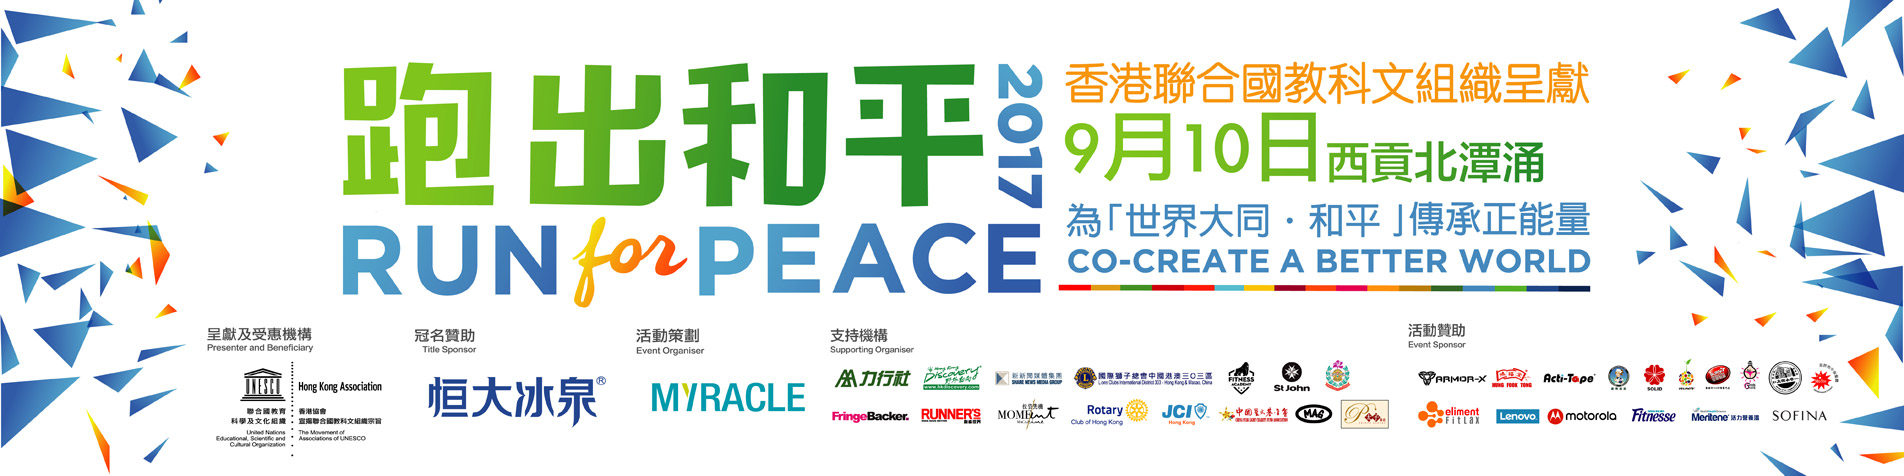 Run for Peace 2017